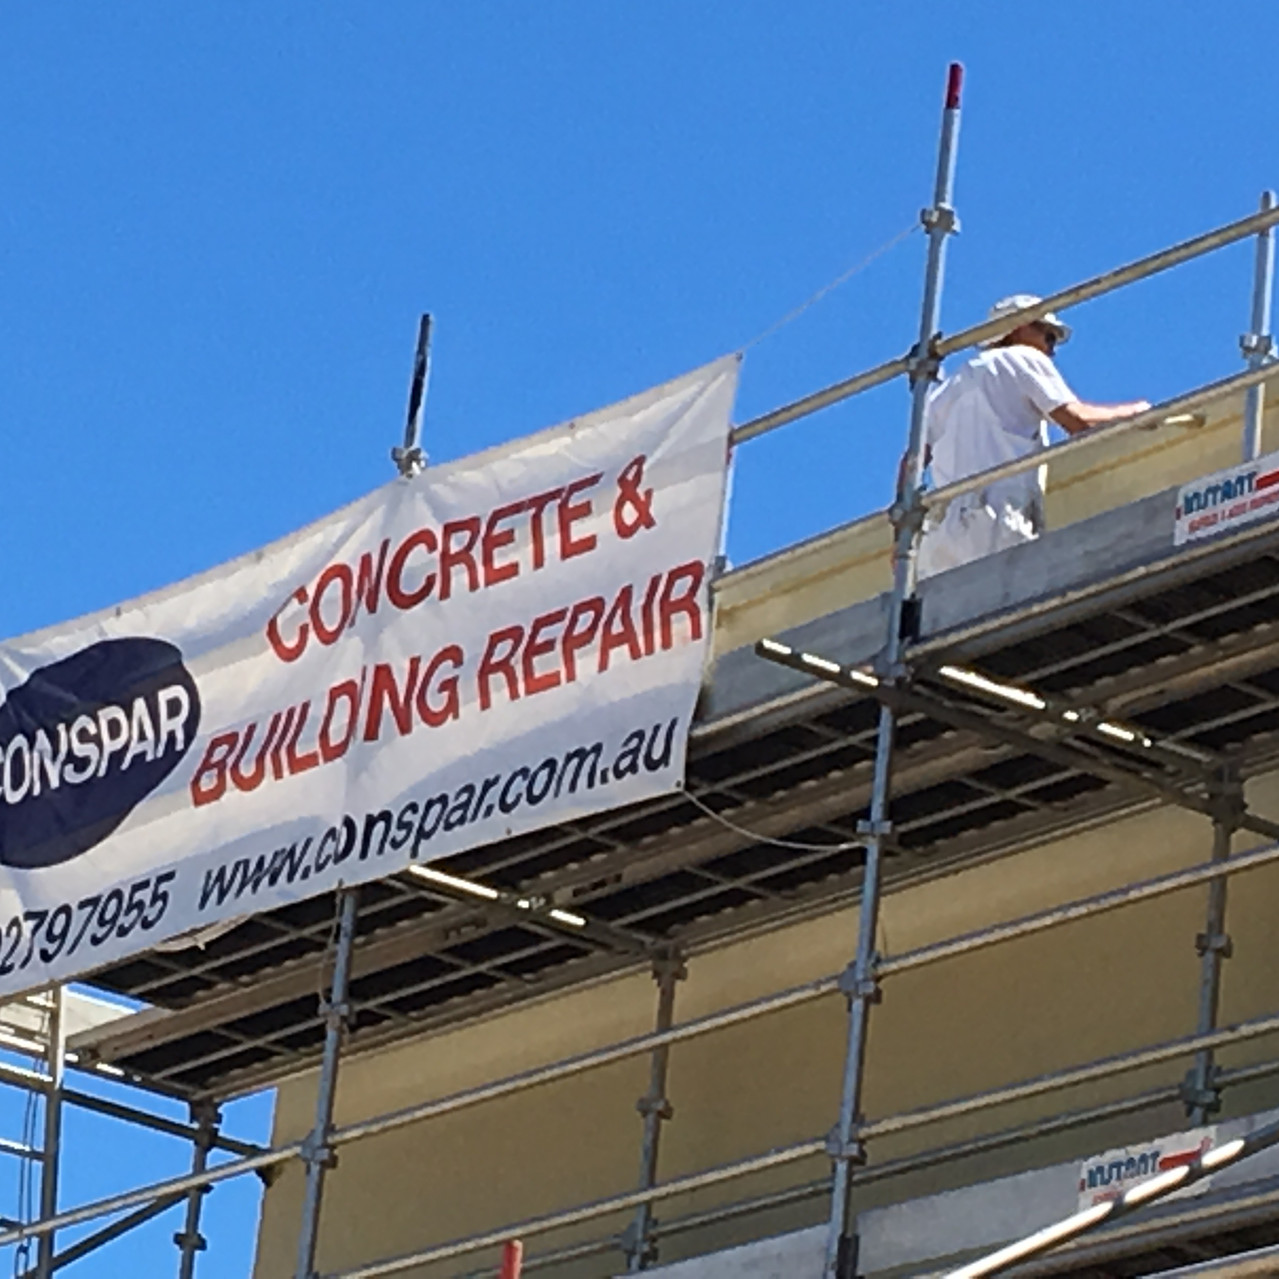 Conspar restoration work at St Patrick's Community Support Centre in Fremantle